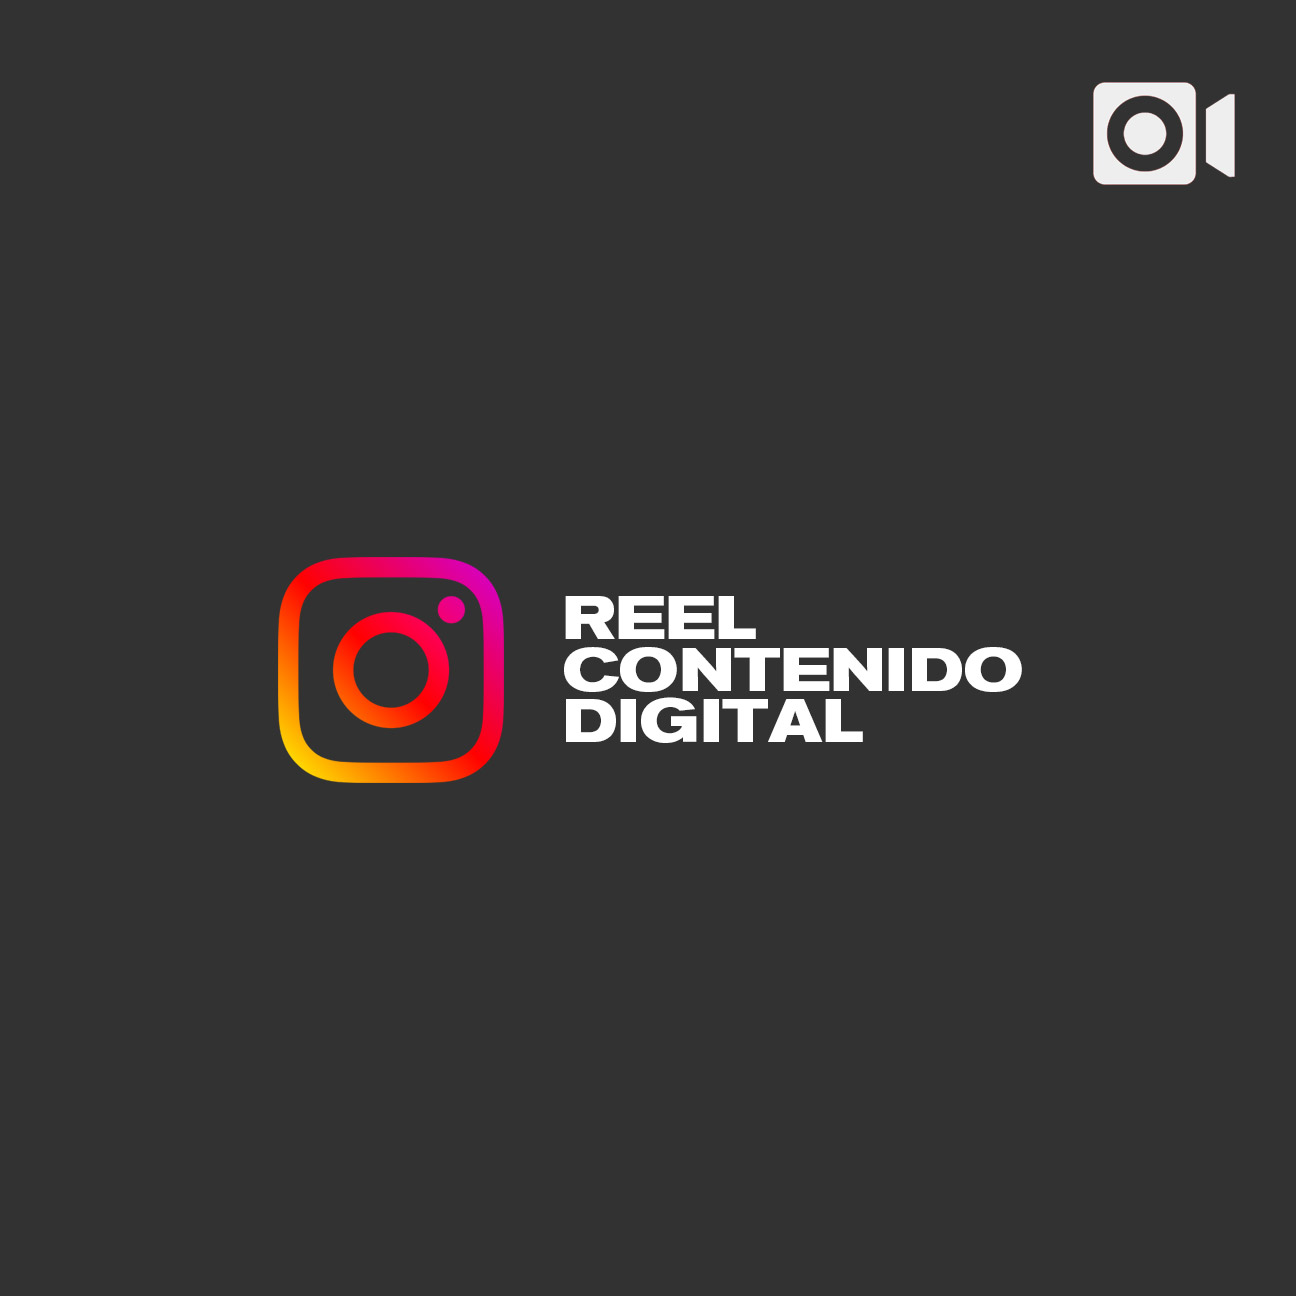 Reel-Contenido-Digital-by-KUCHA